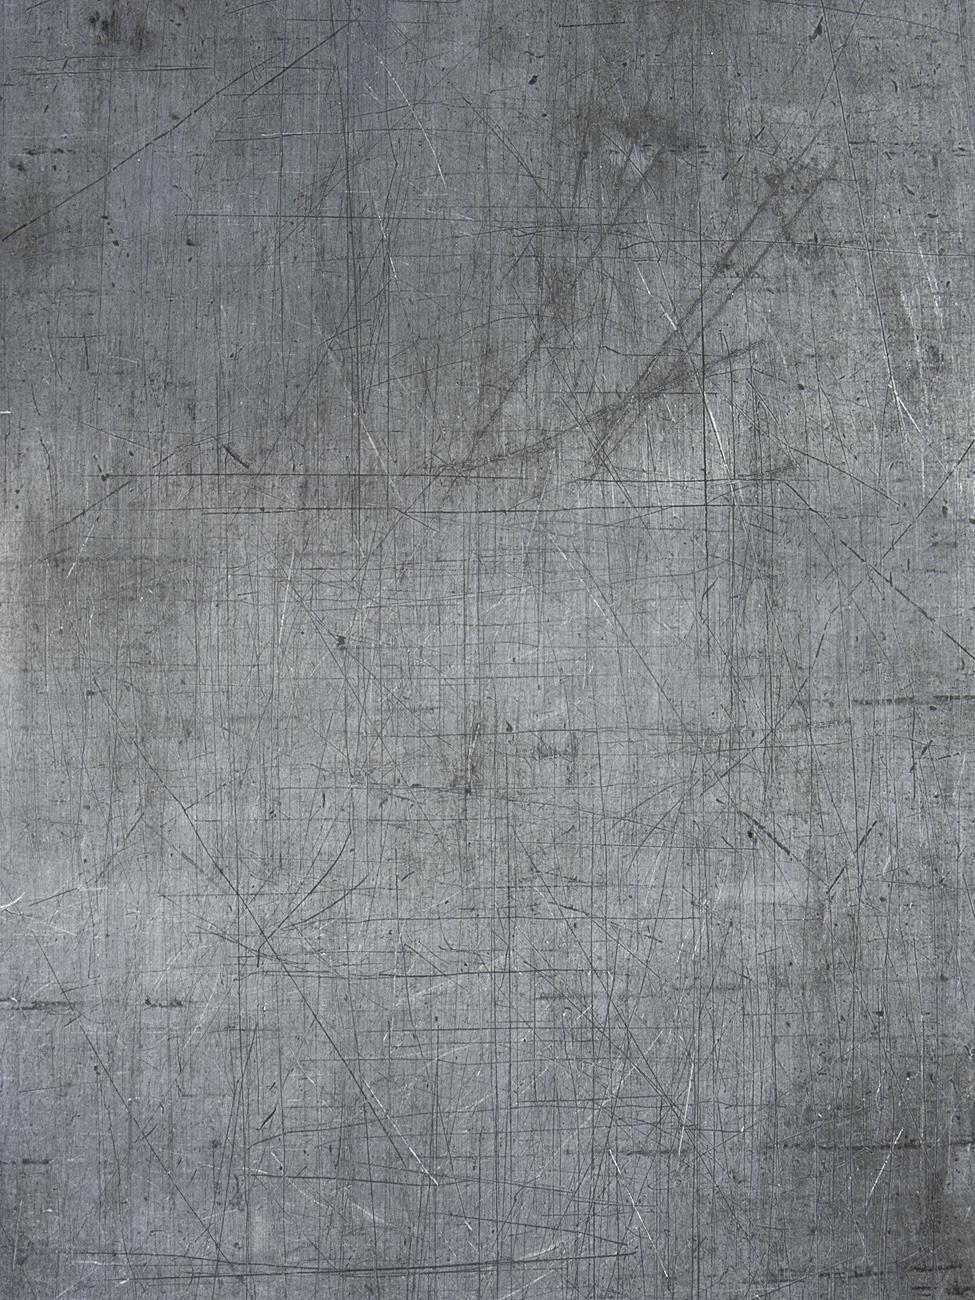 aluminum, texture, background, download, aluminum texture background